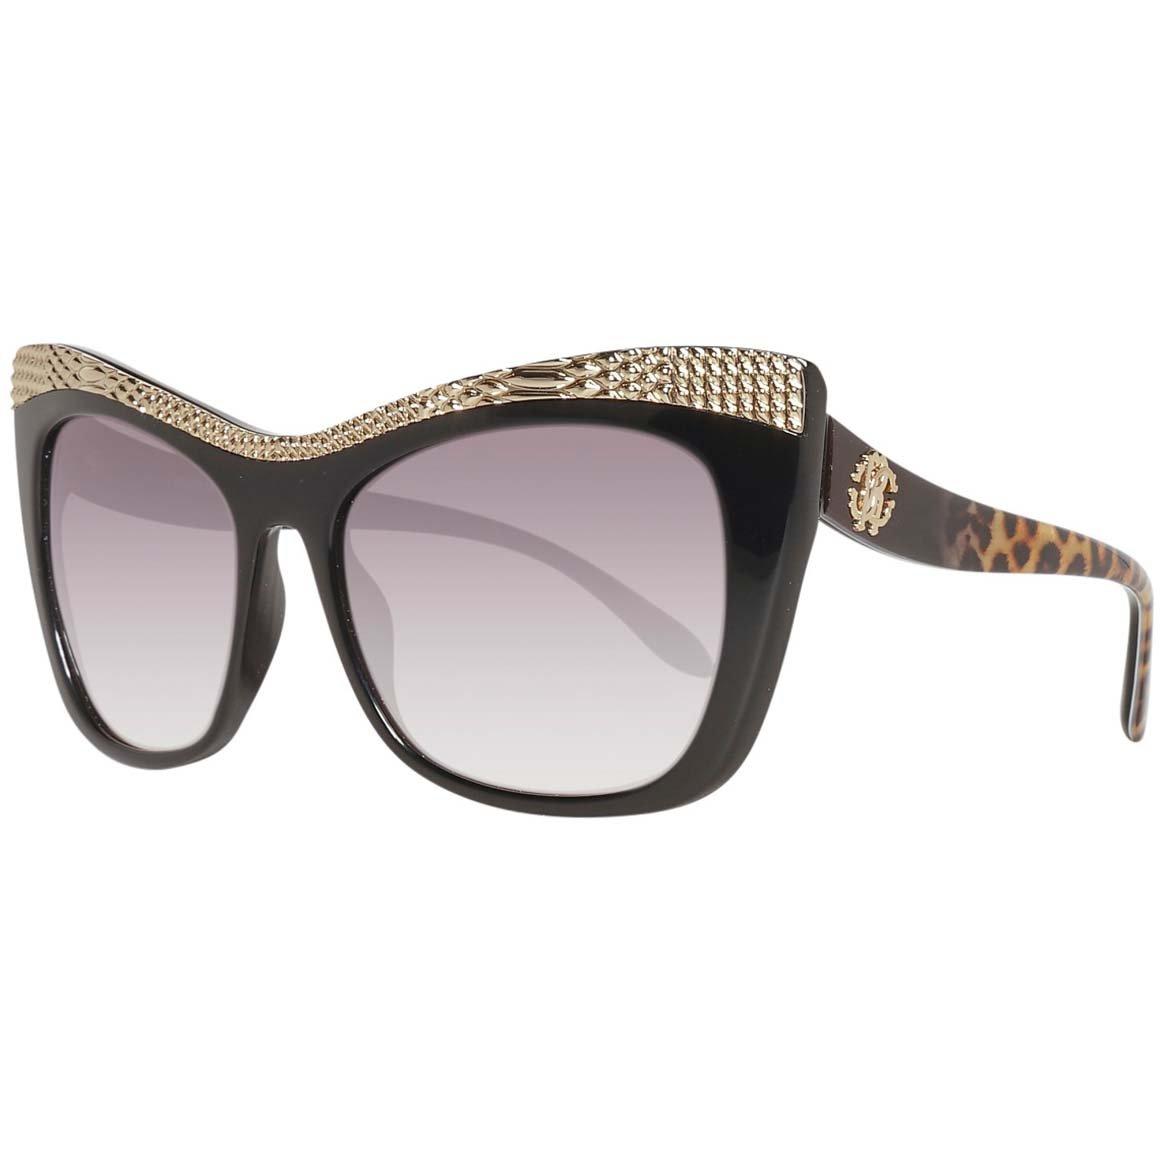 Amazon.com: anteojos de sol Roberto Cavalli RC 921s-a rc921s ...